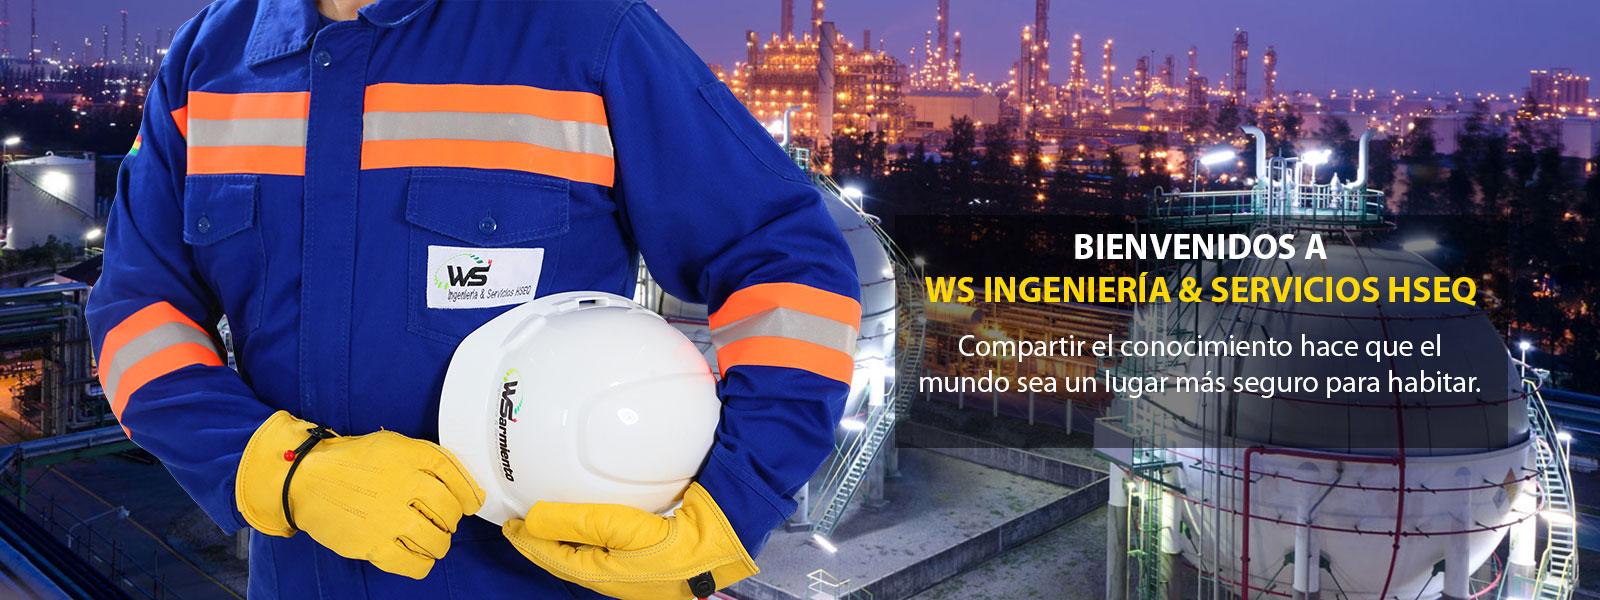 wsafe-industrias-gaseoductos